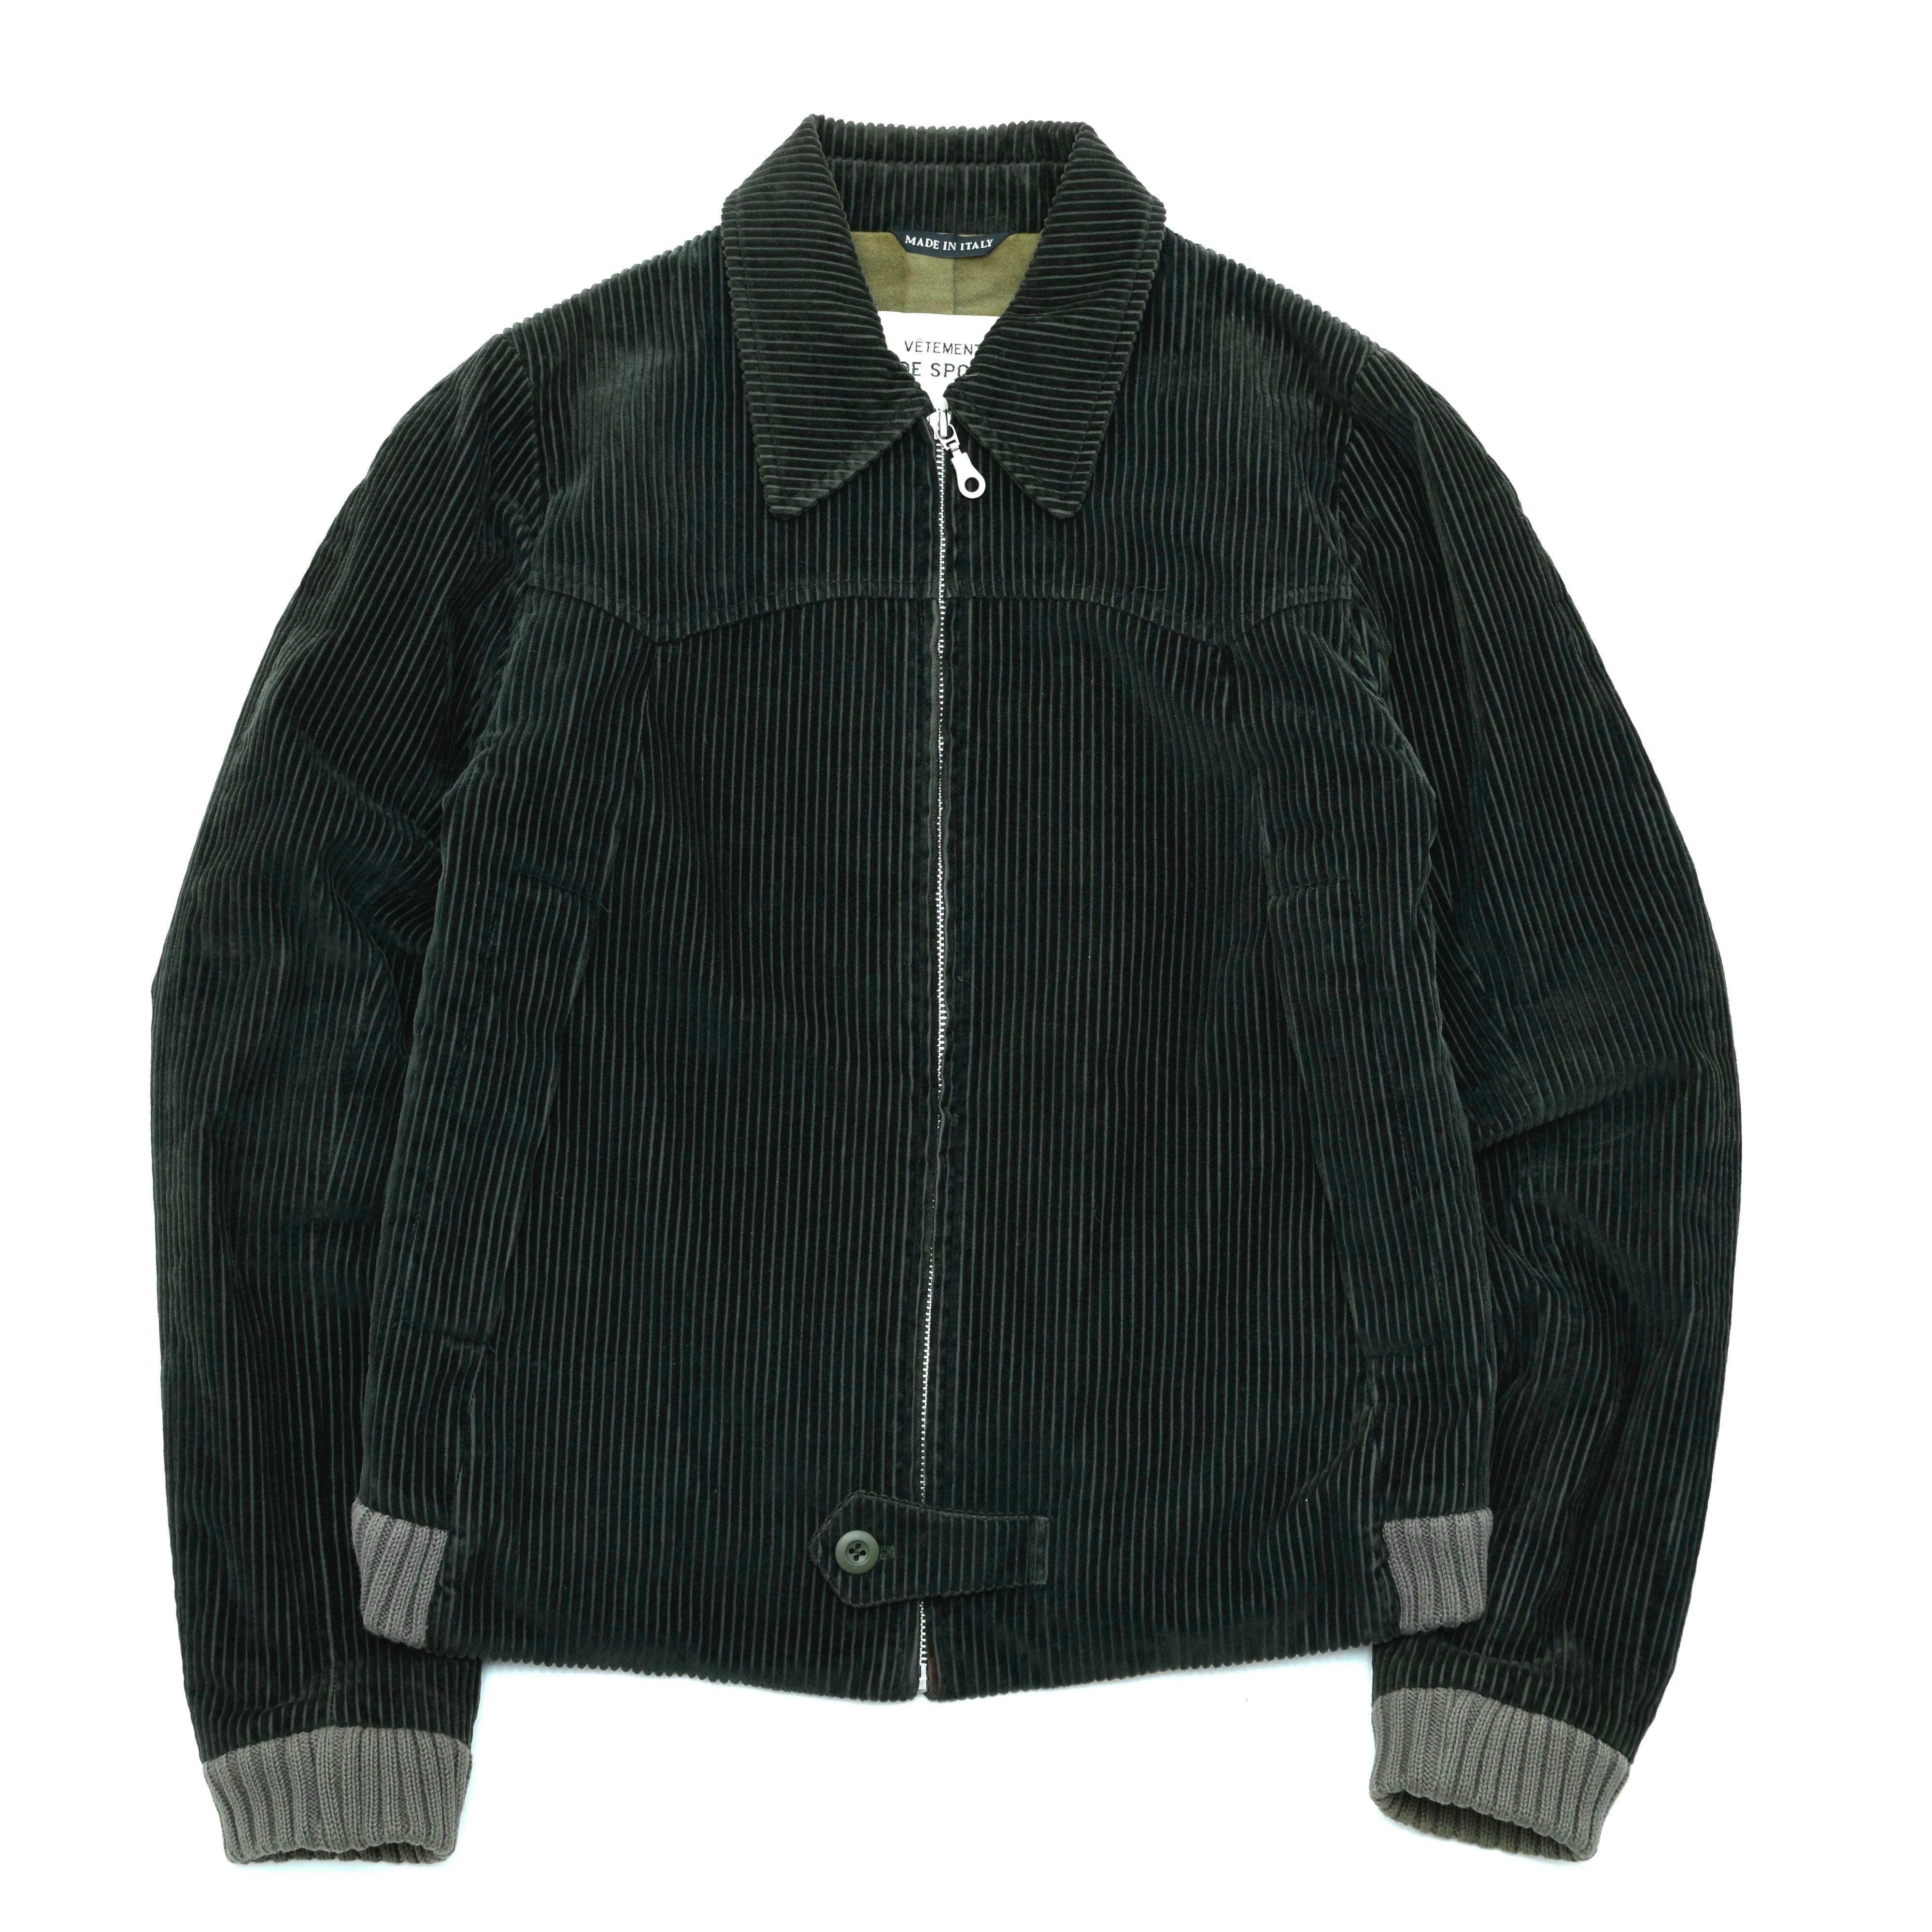 Made in Italy Dark green corduroy jacket